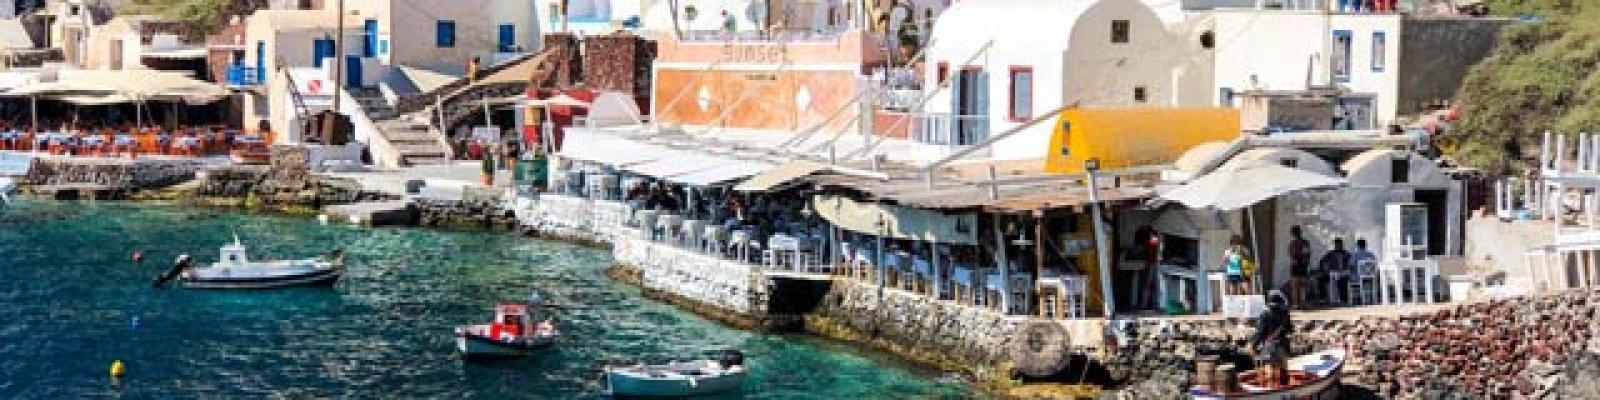 Amoudi Bay Oia